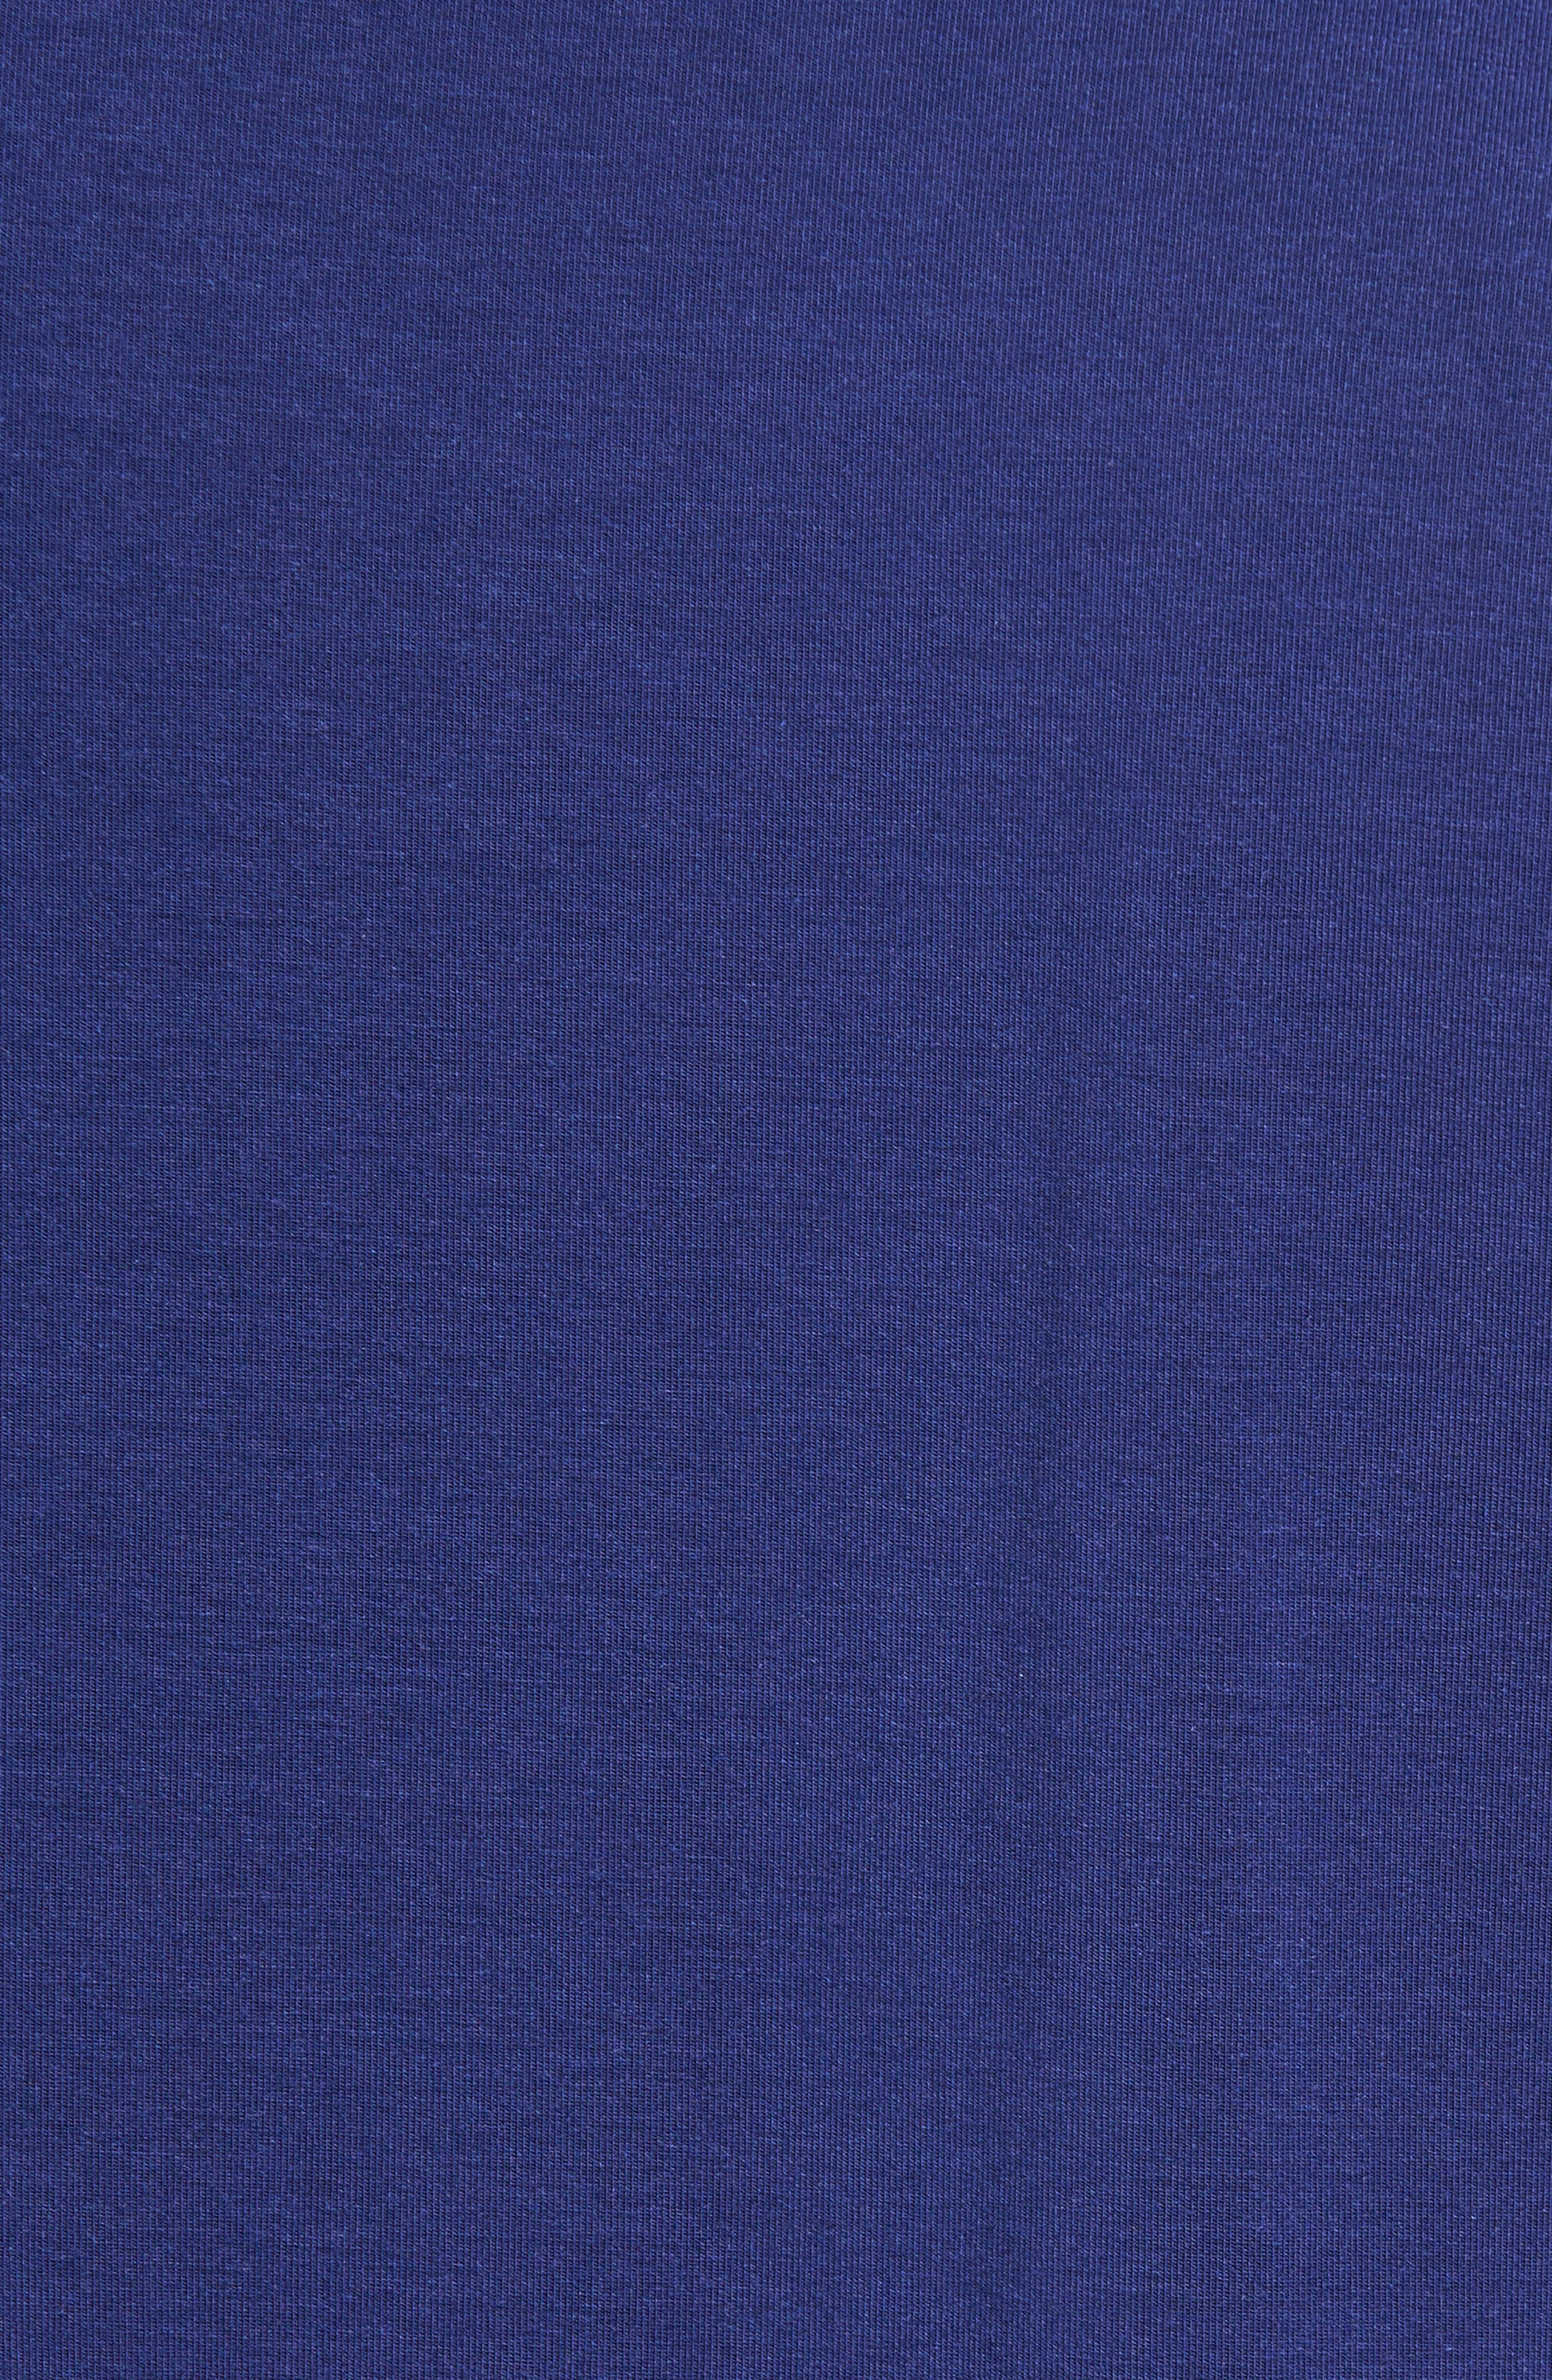 V-Neck Stretch Modal T-Shirt,                             Alternate thumbnail 5, color,                             413